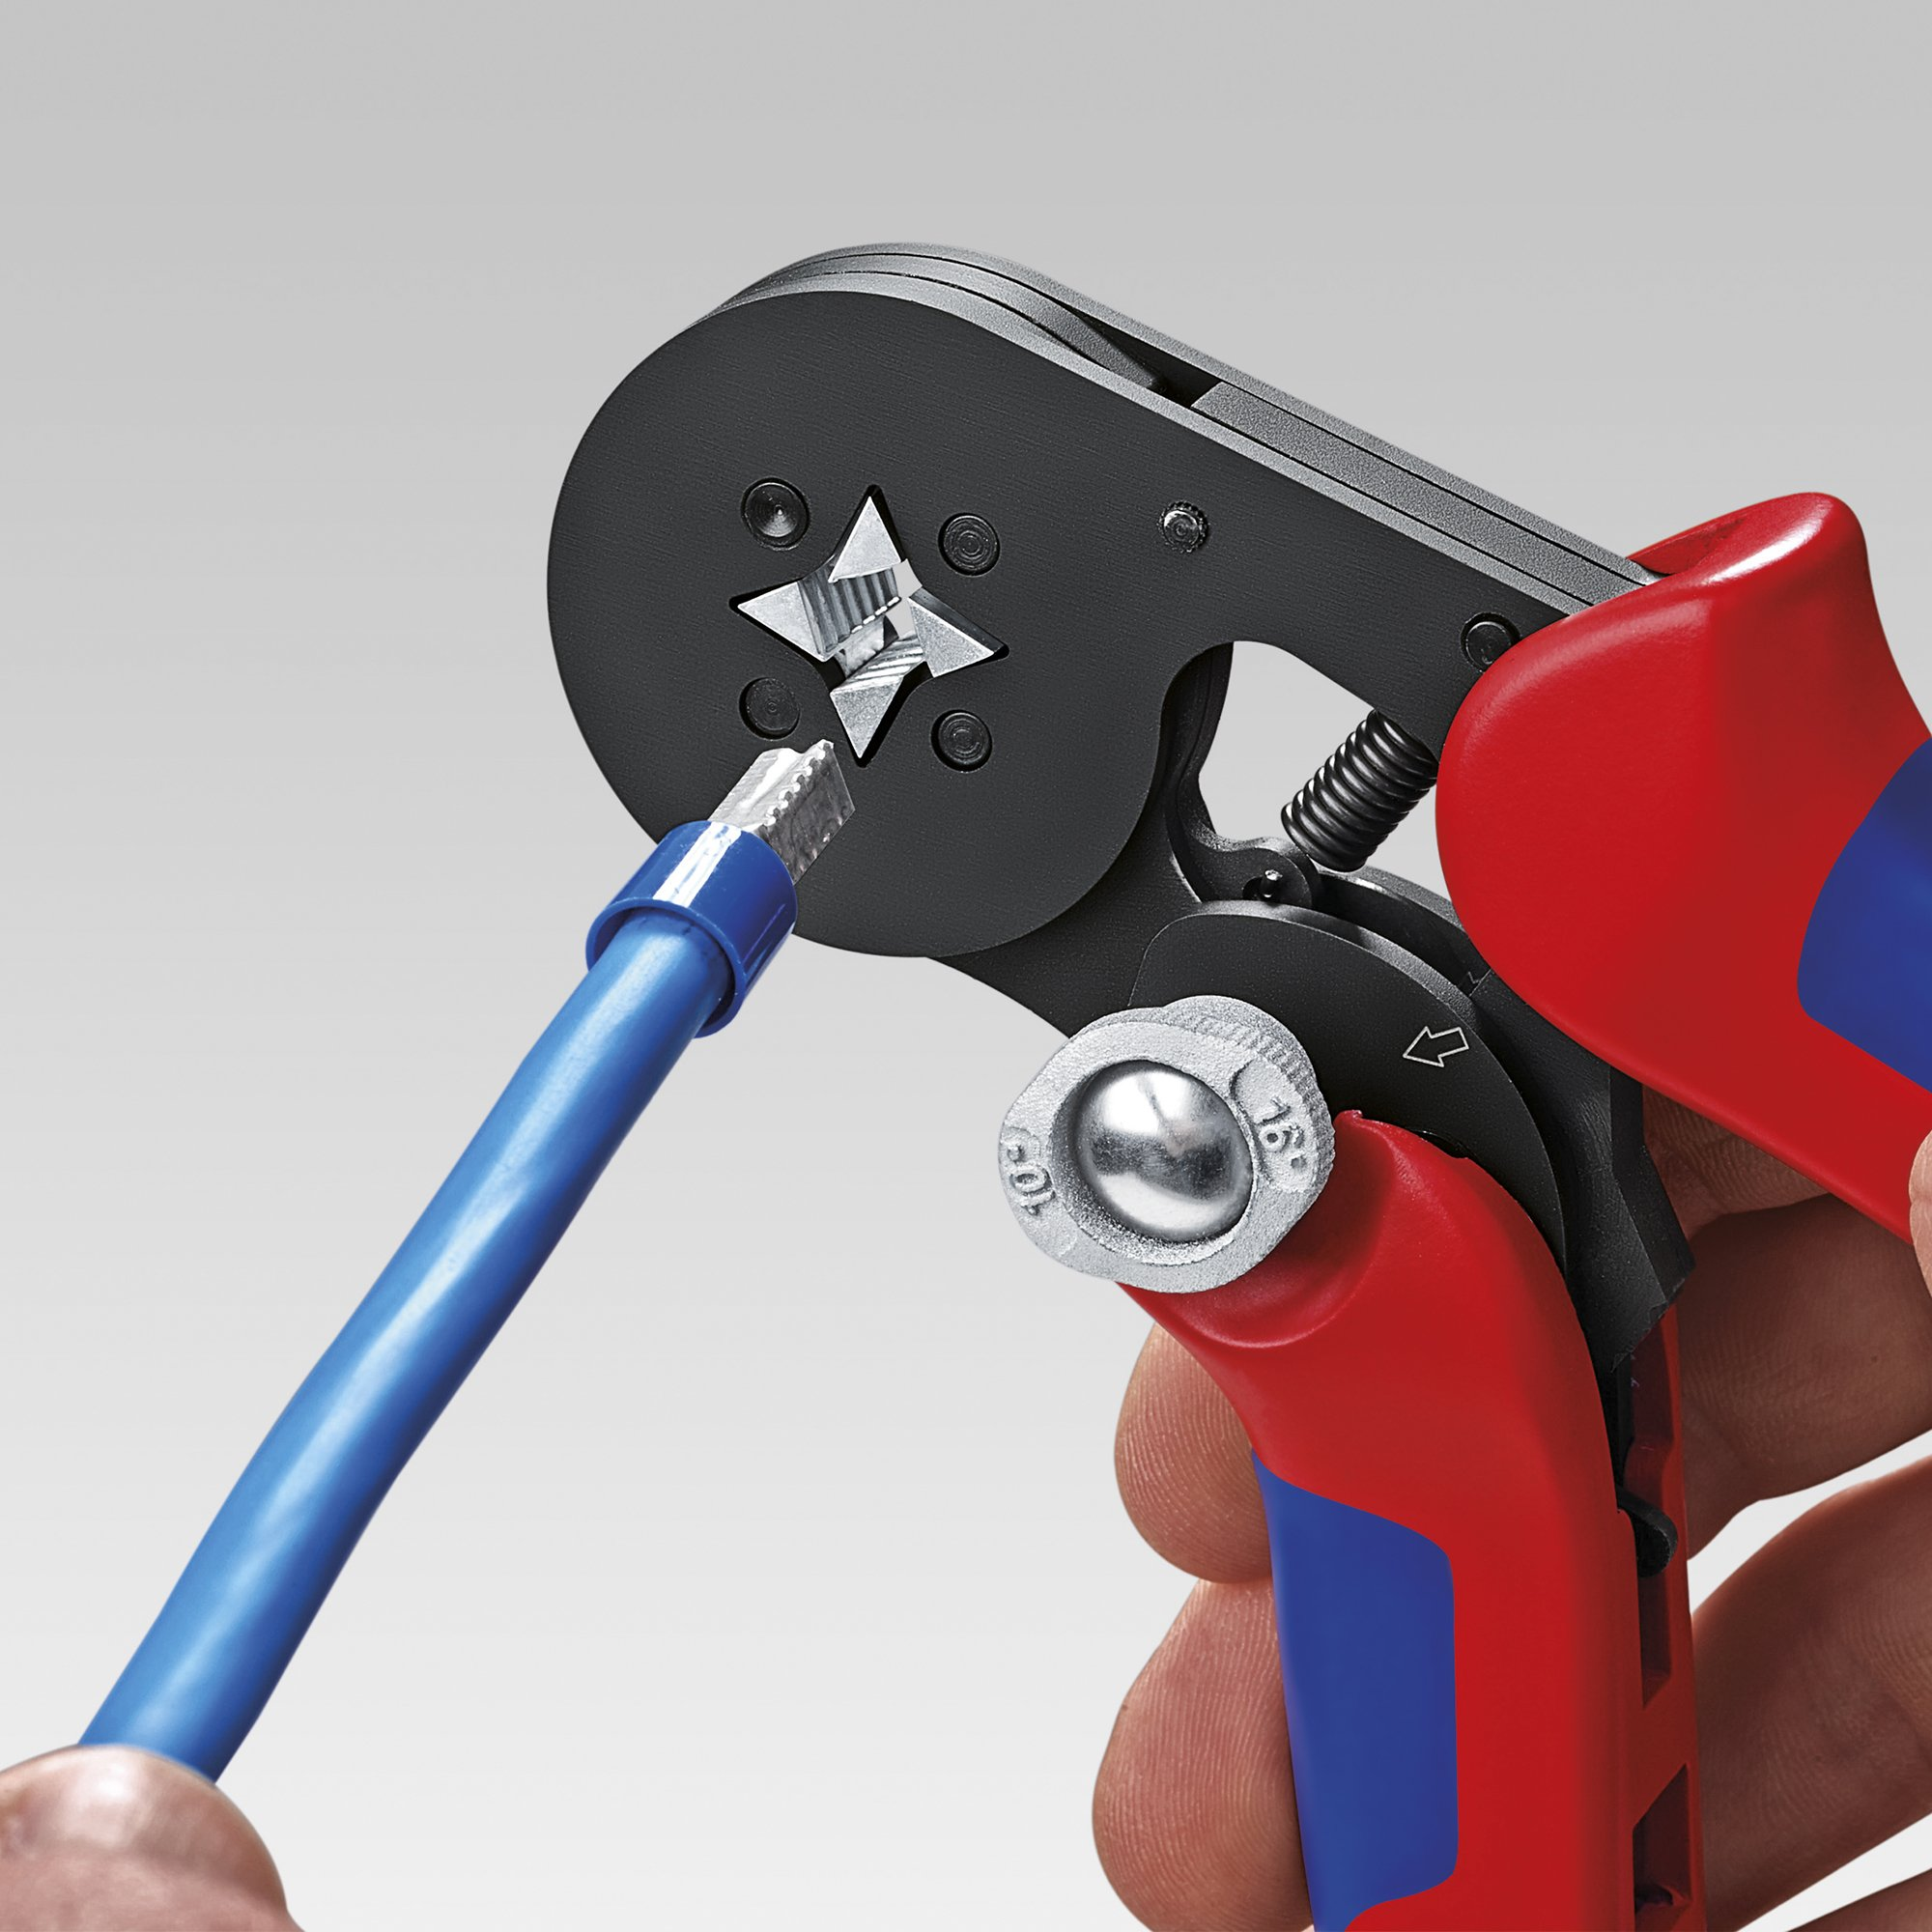 KNIPEX 97 53 04 Self-Adjusting Crimping Pliers